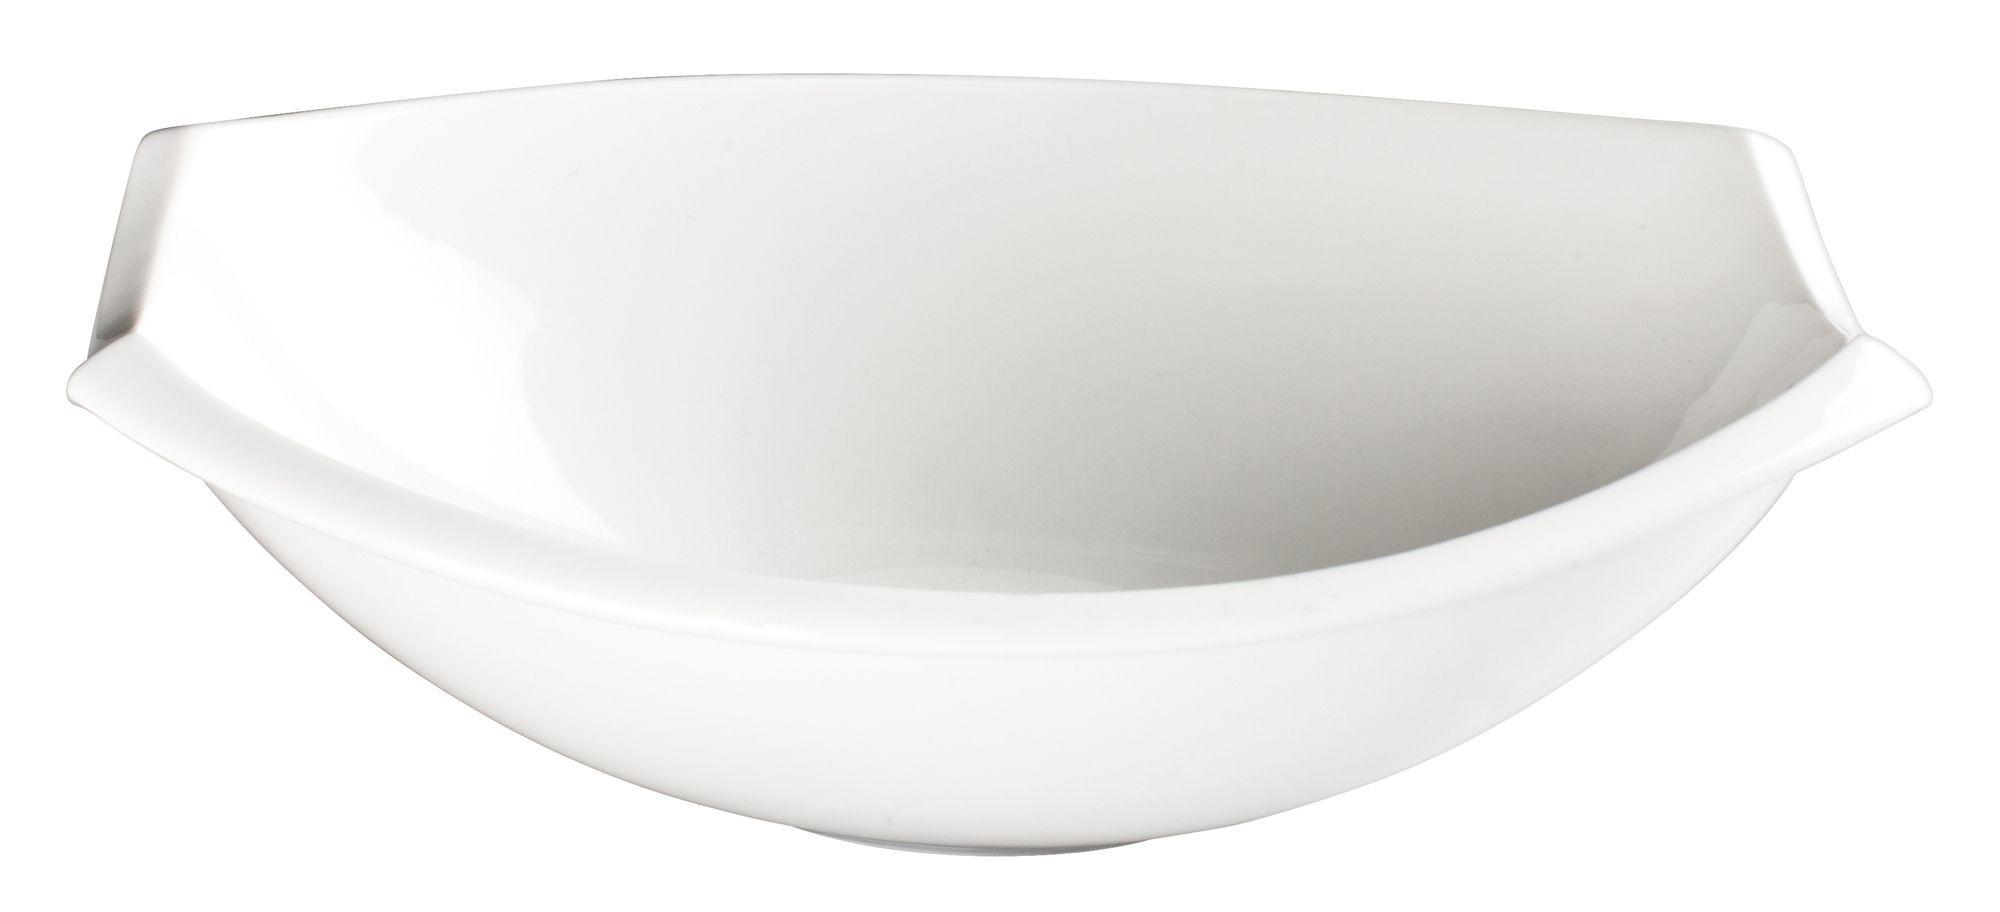 "Winco WDP006-206 Bergomi Creamy White Porcelain Oval Bowl 13"""